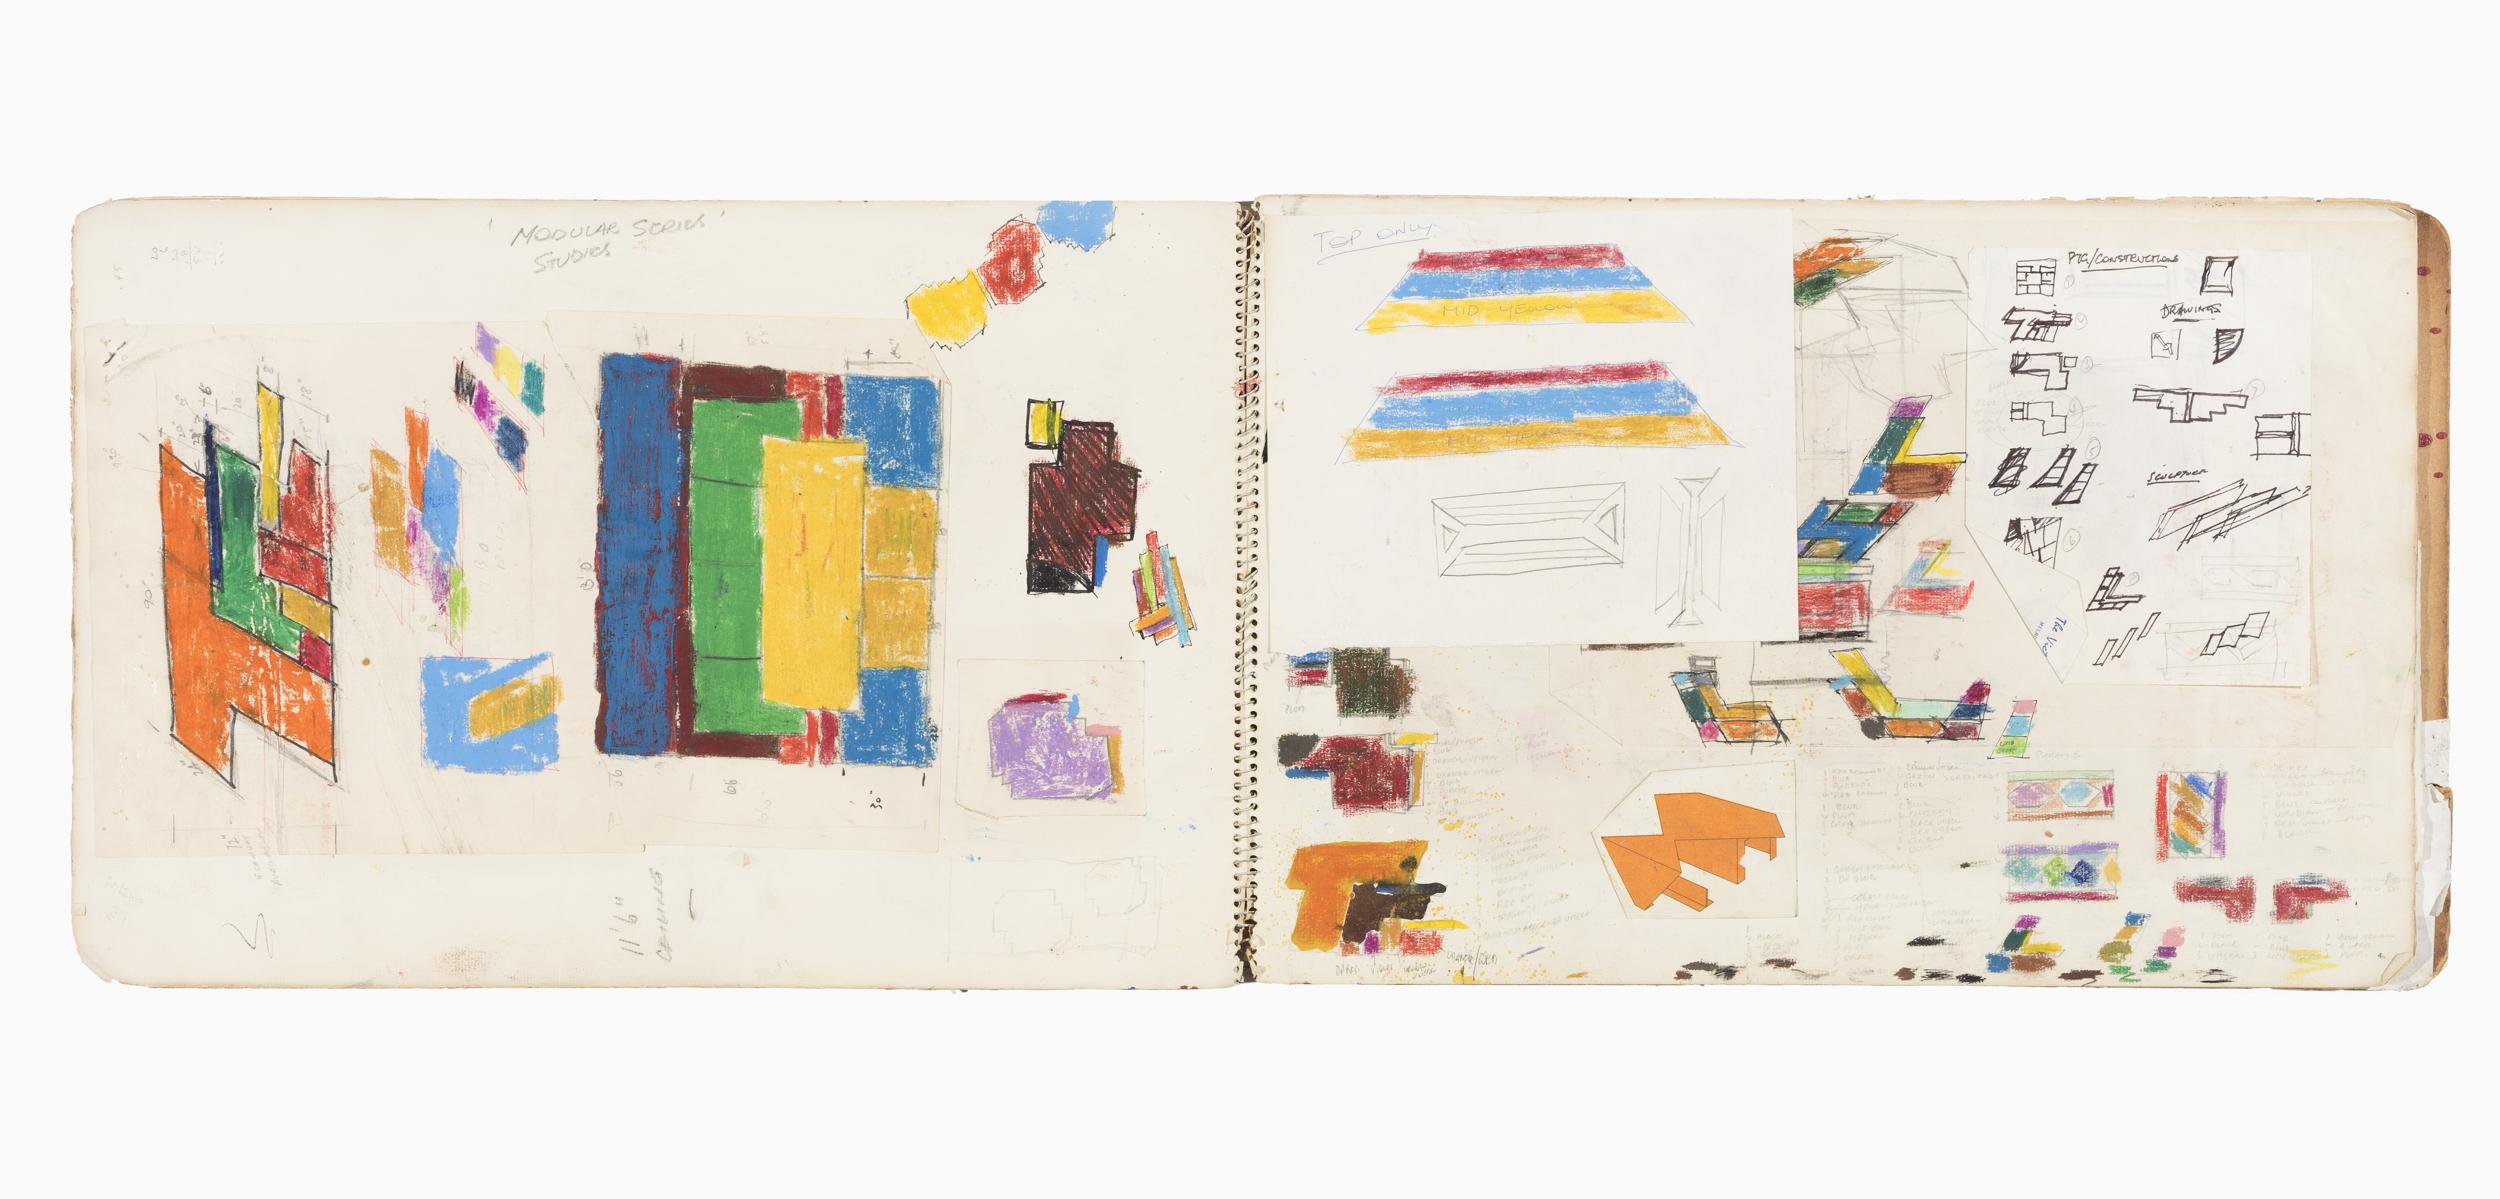 Sydney Ball Book_1965-1969_002.jpg